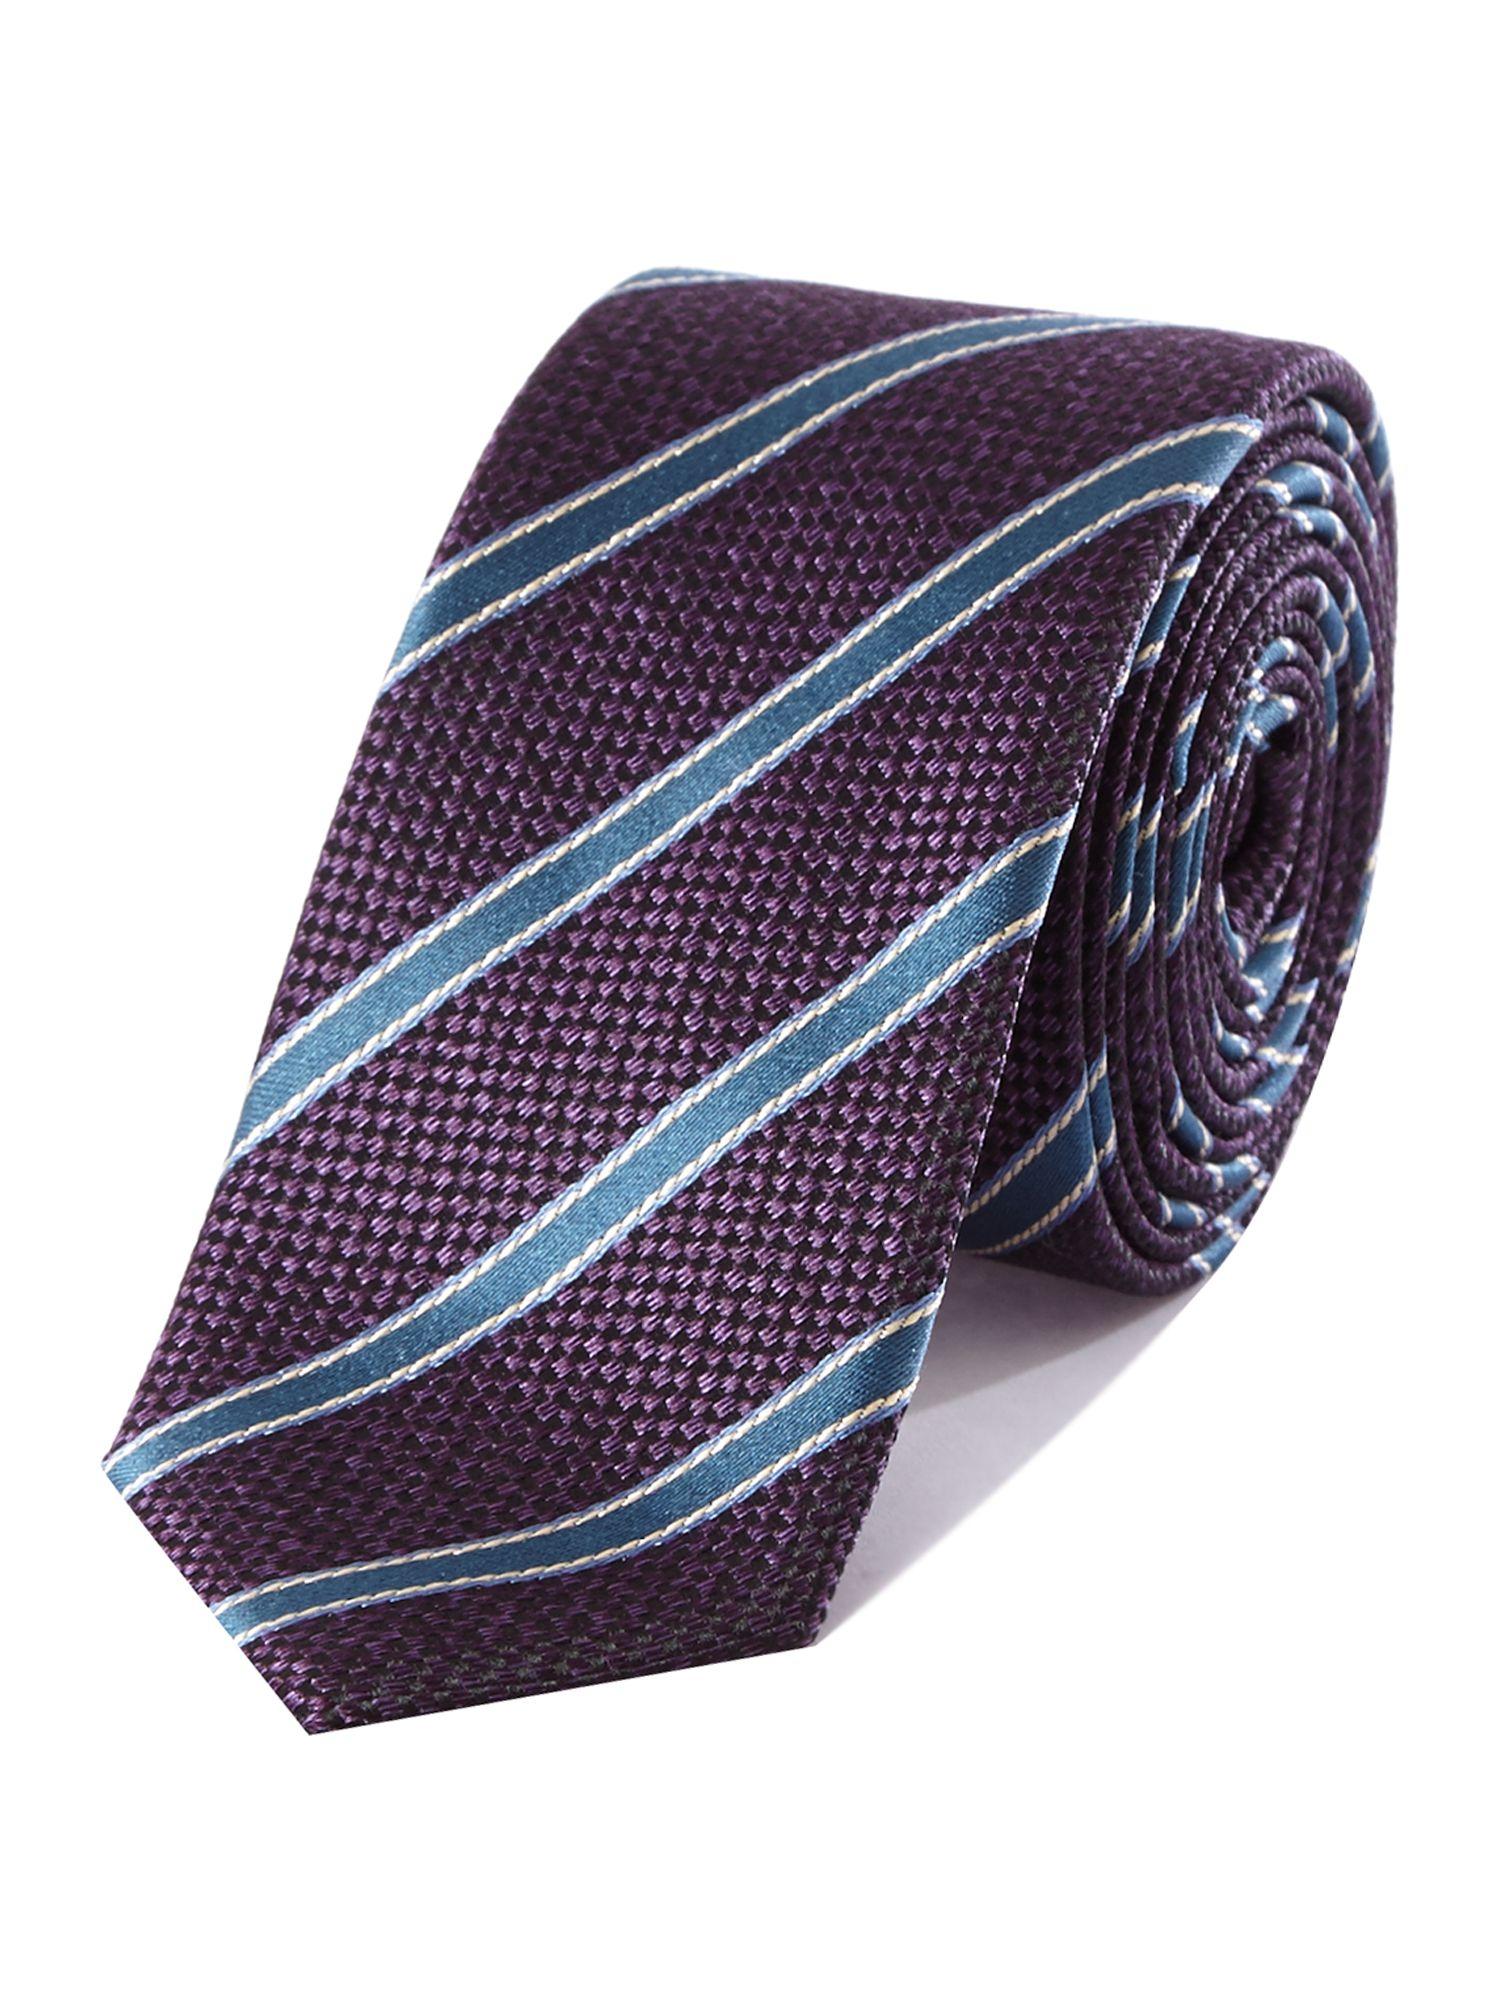 157b0696604fa6 Ted Baker Stripe Slim Tie in Purple for Men - Lyst